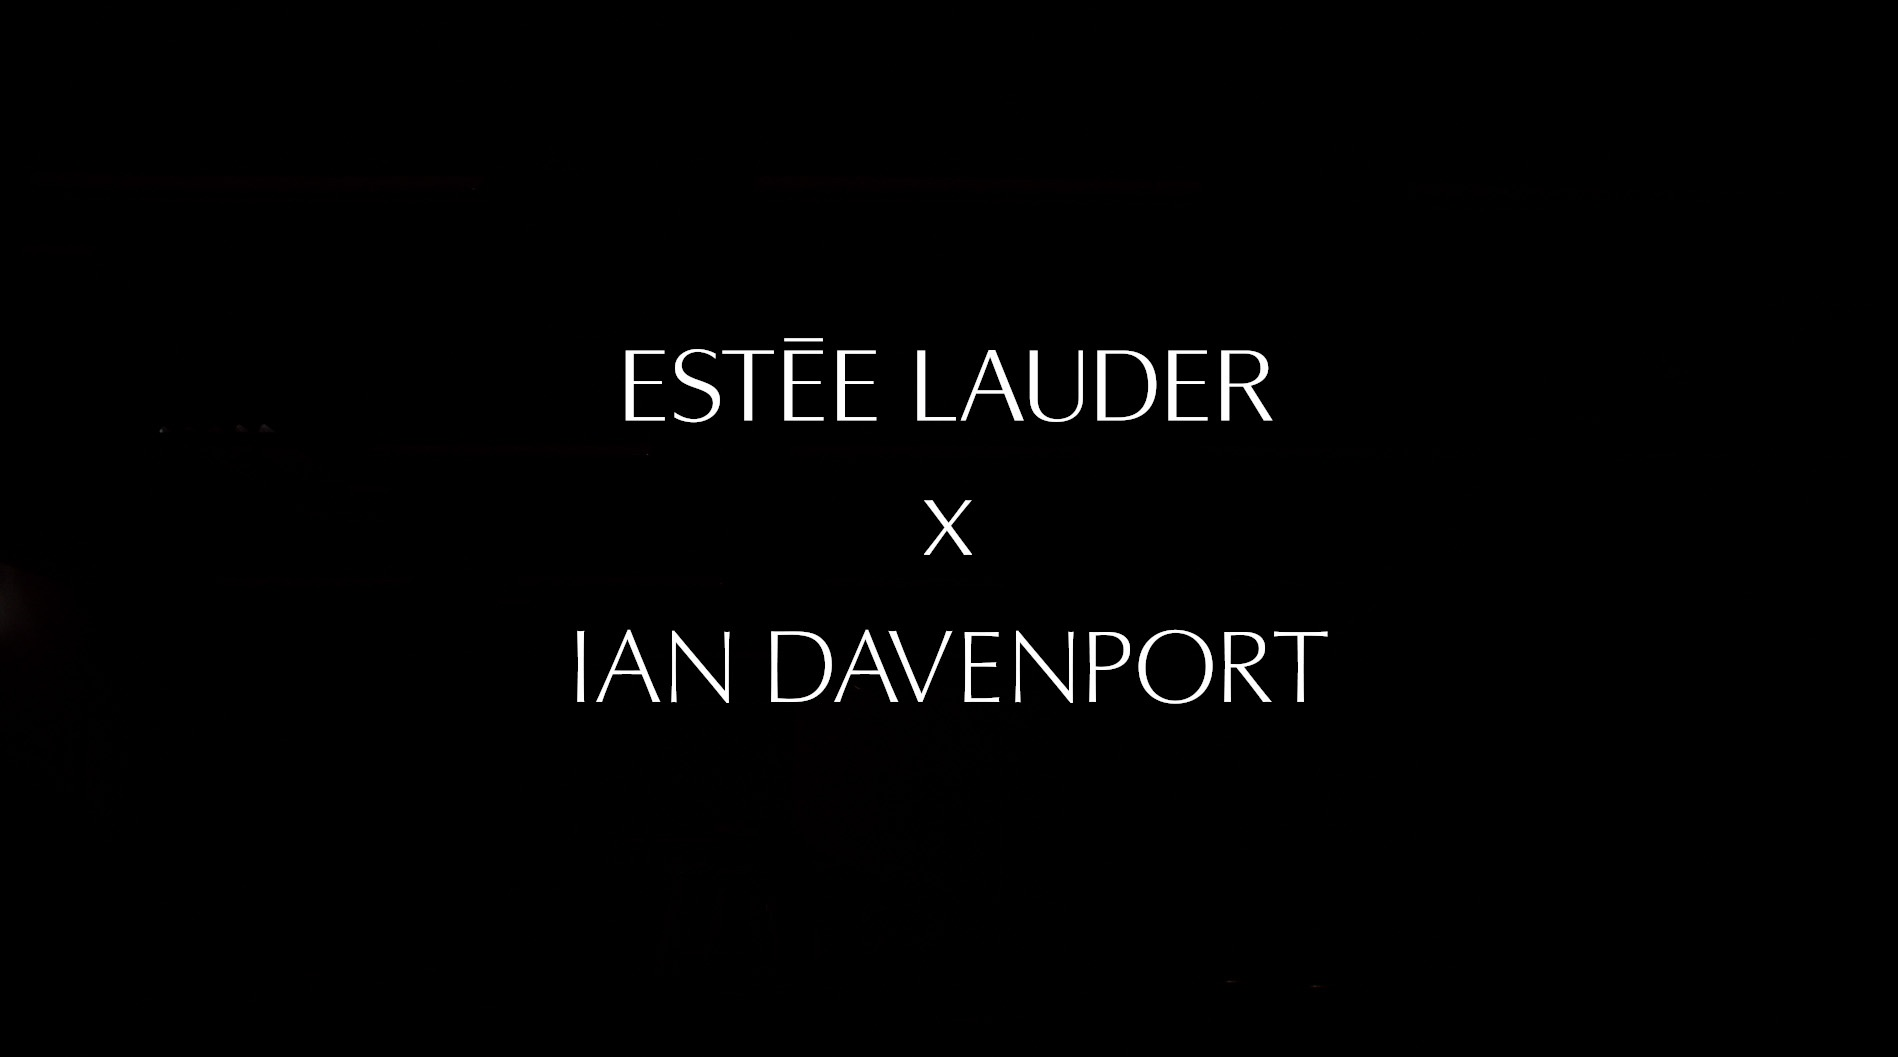 Thumbnail for Estee Lauder X Ian Davenport